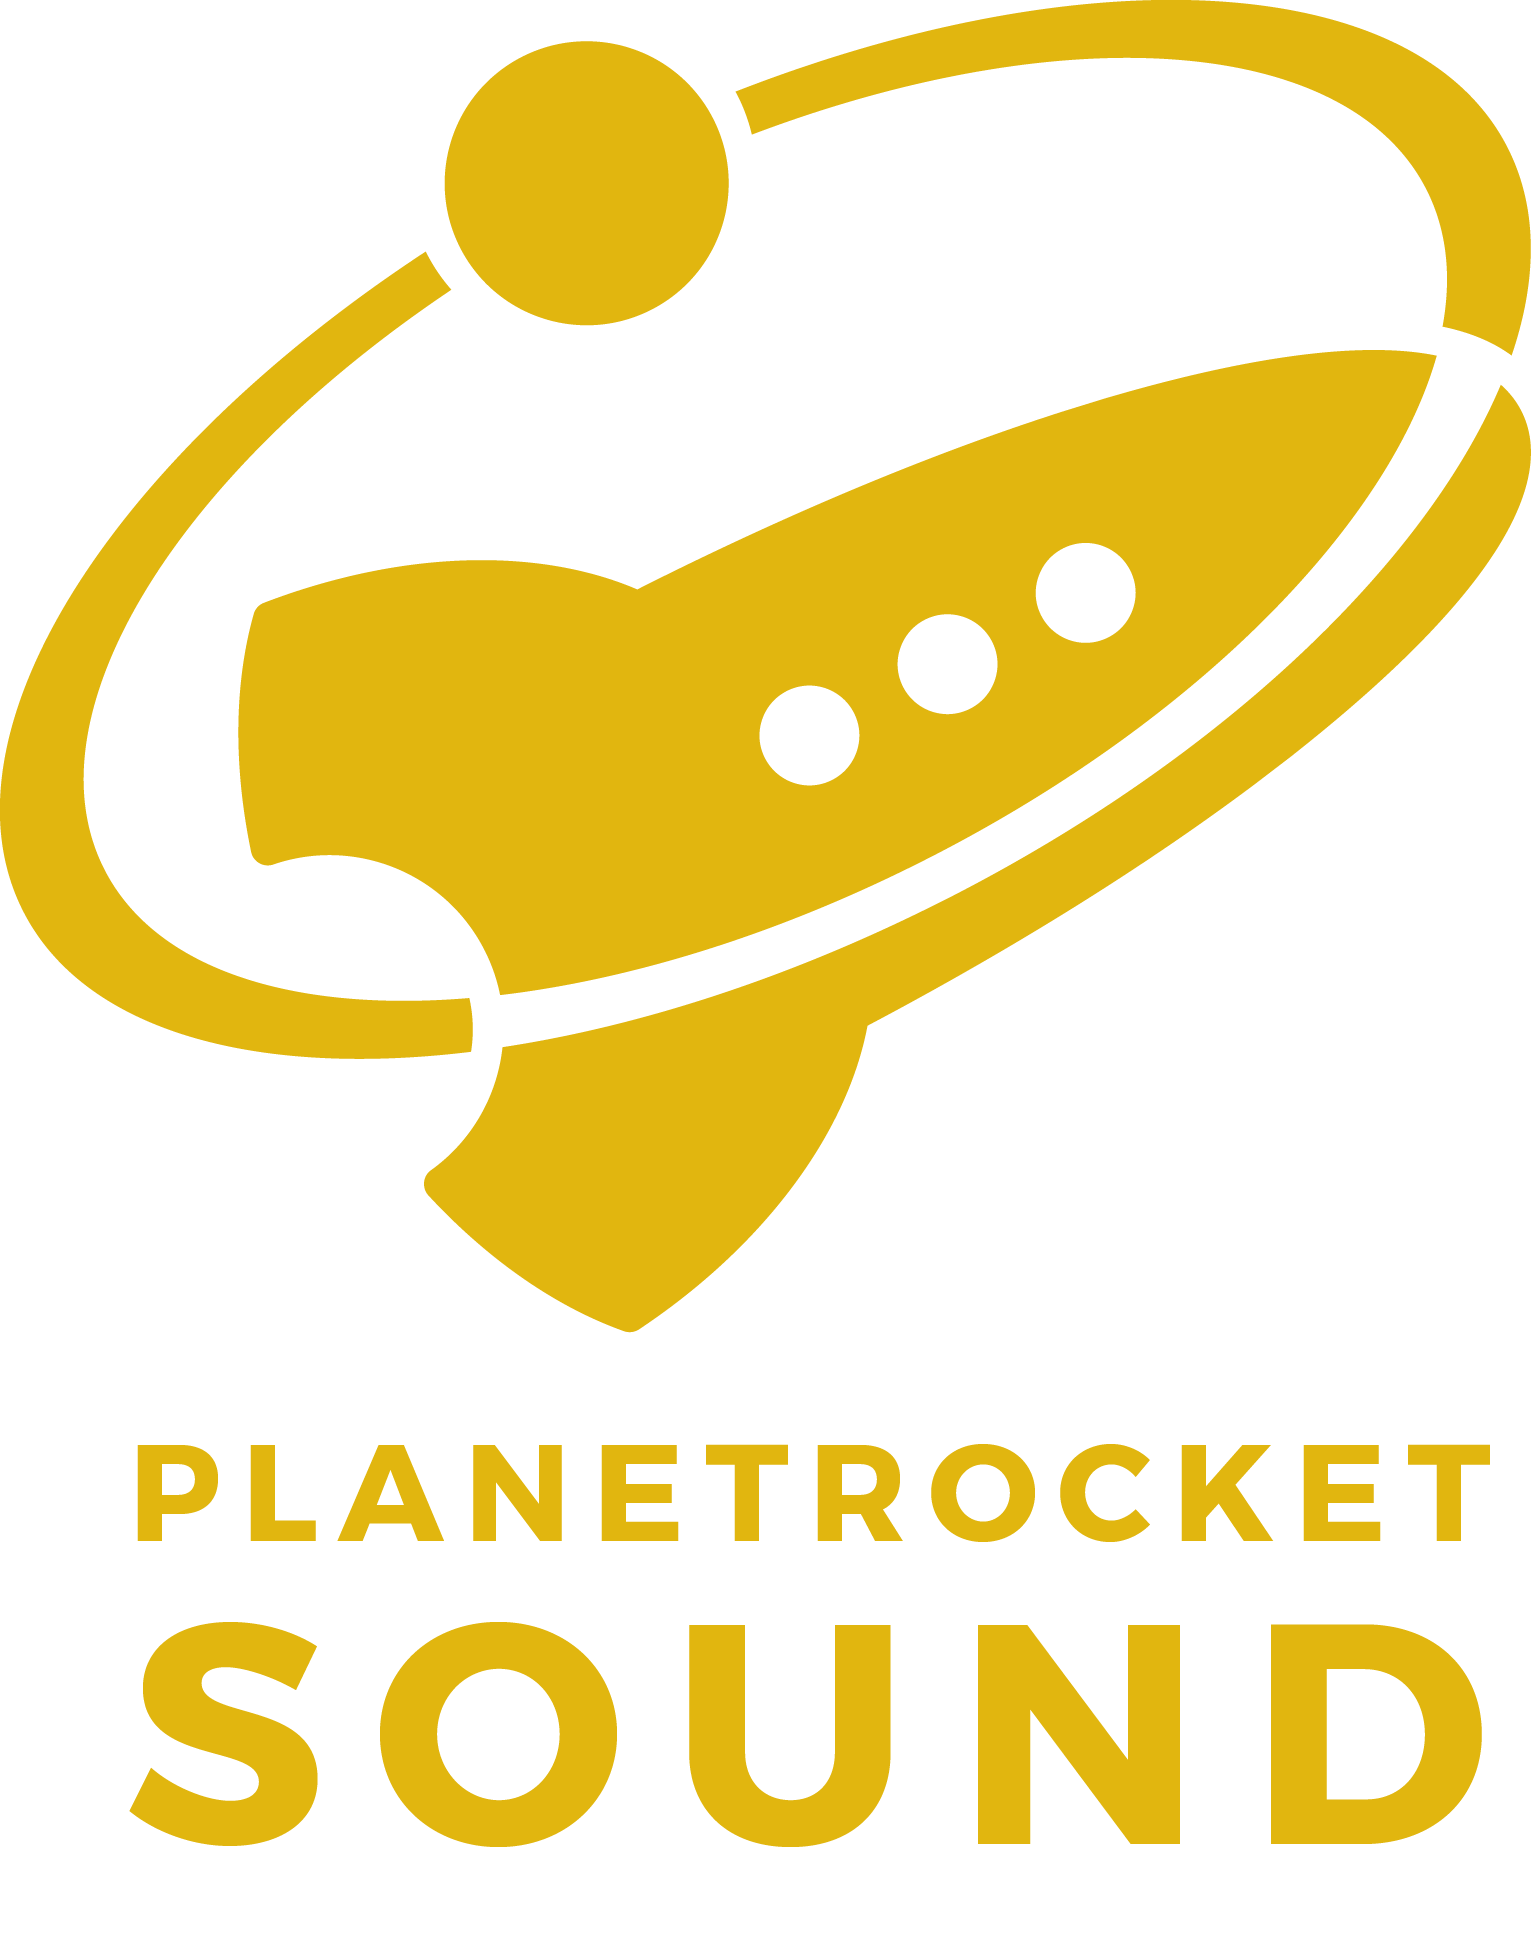 Planet Rocket Sound